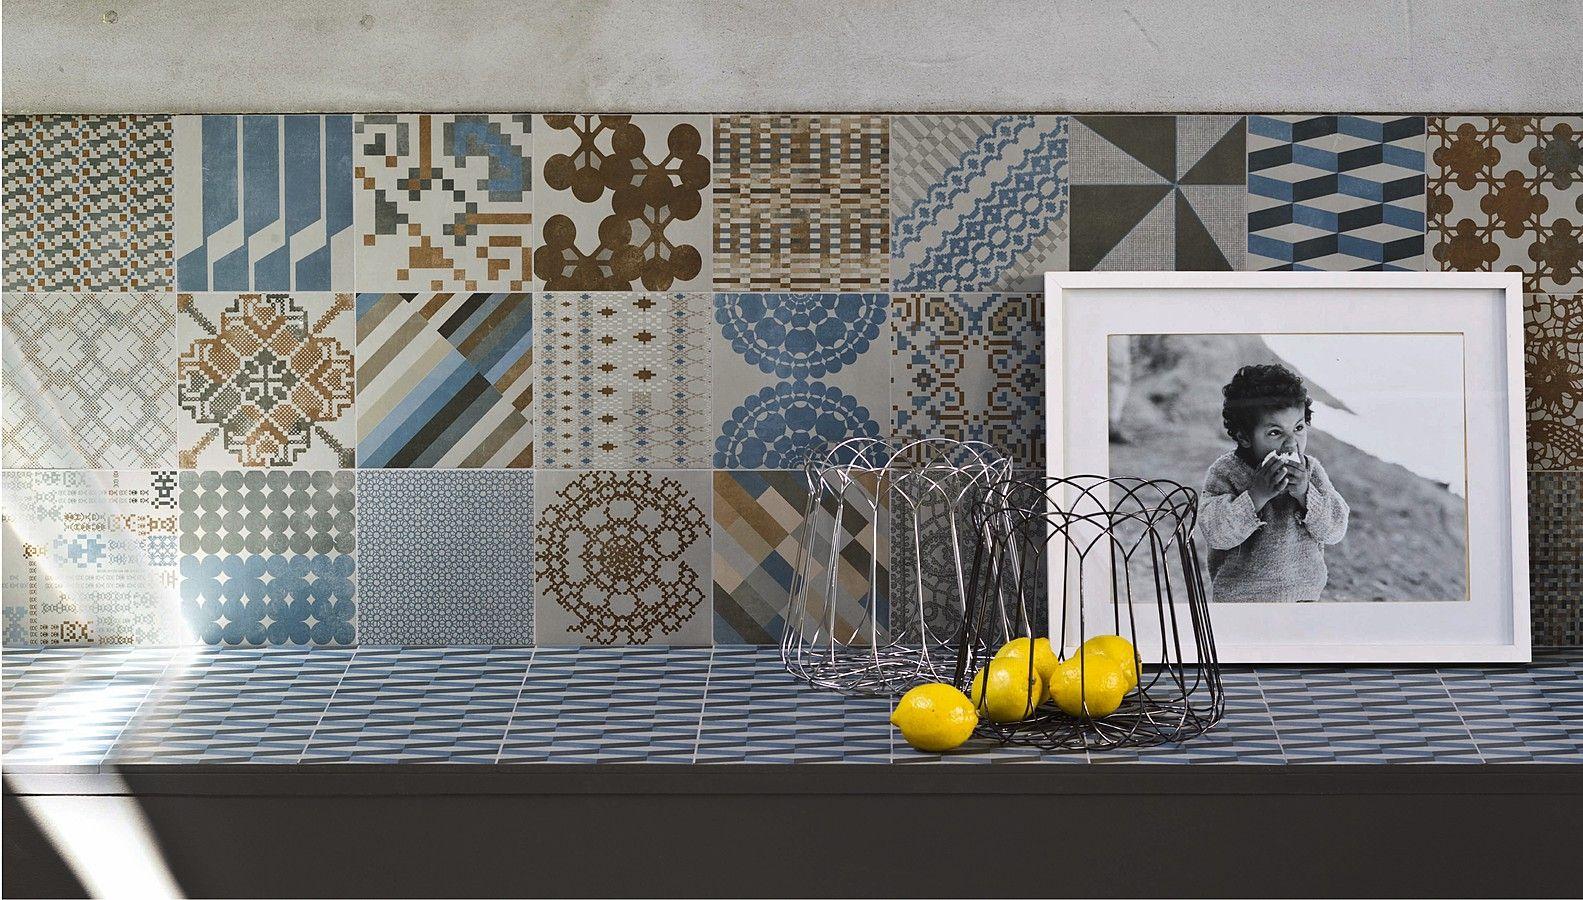 https://tile.expert/img_lb/Mutina/Azulej/per_sito/ambienti/Azulej-Mutina-7.jpg , Kitchen, Living room, Public spaces, Bathroom, Patchwork style, Designer style, Patricia Urquiola, Concrete effect, Porcelain stoneware, wall & floor, Matte, Non-rectified